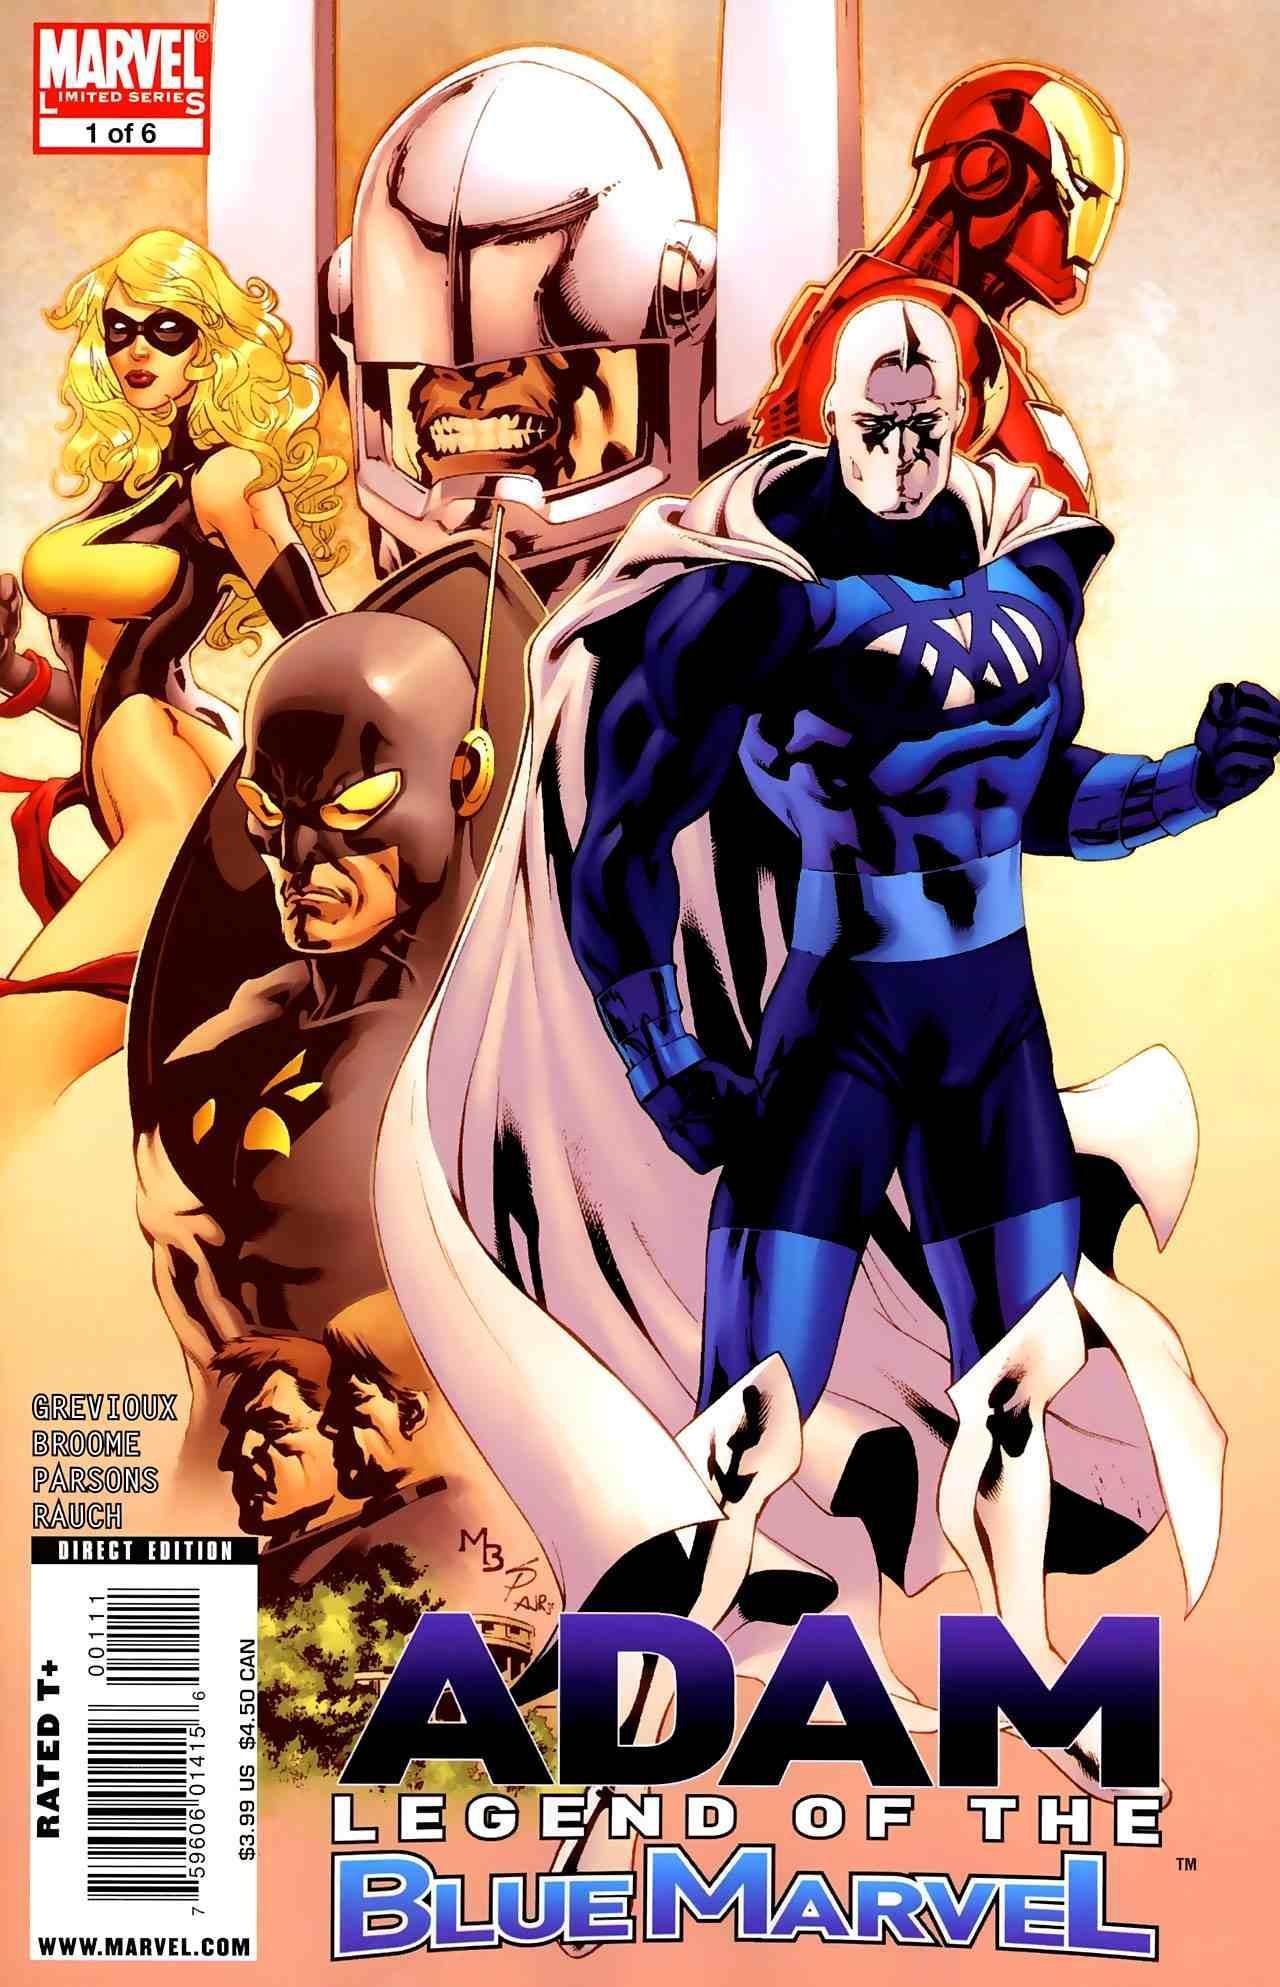 adam,_legend_of_the_blue_marvel_(2009)